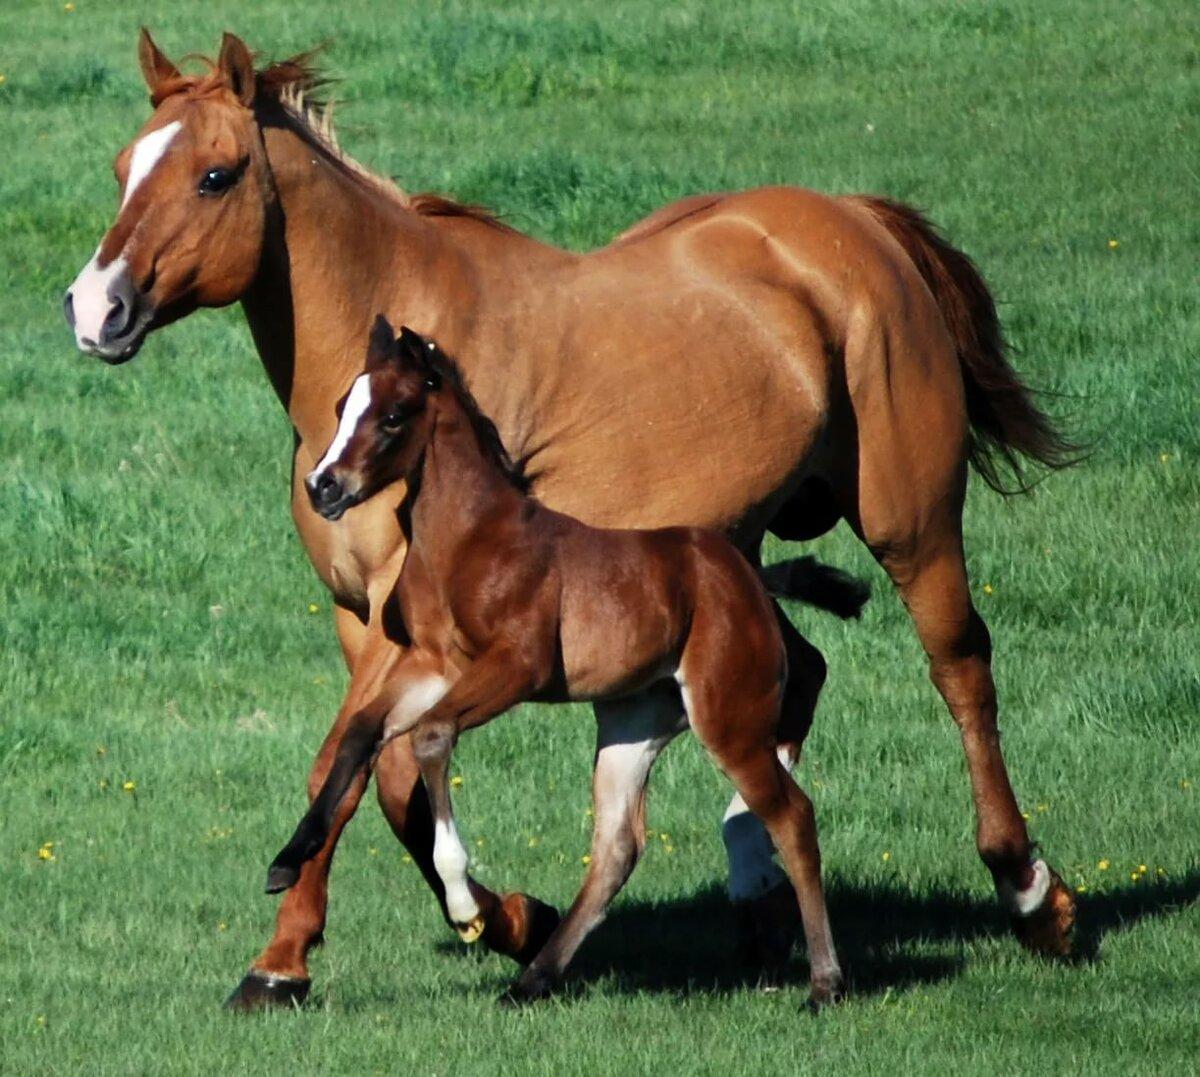 Картинки лошадь с жеребенком